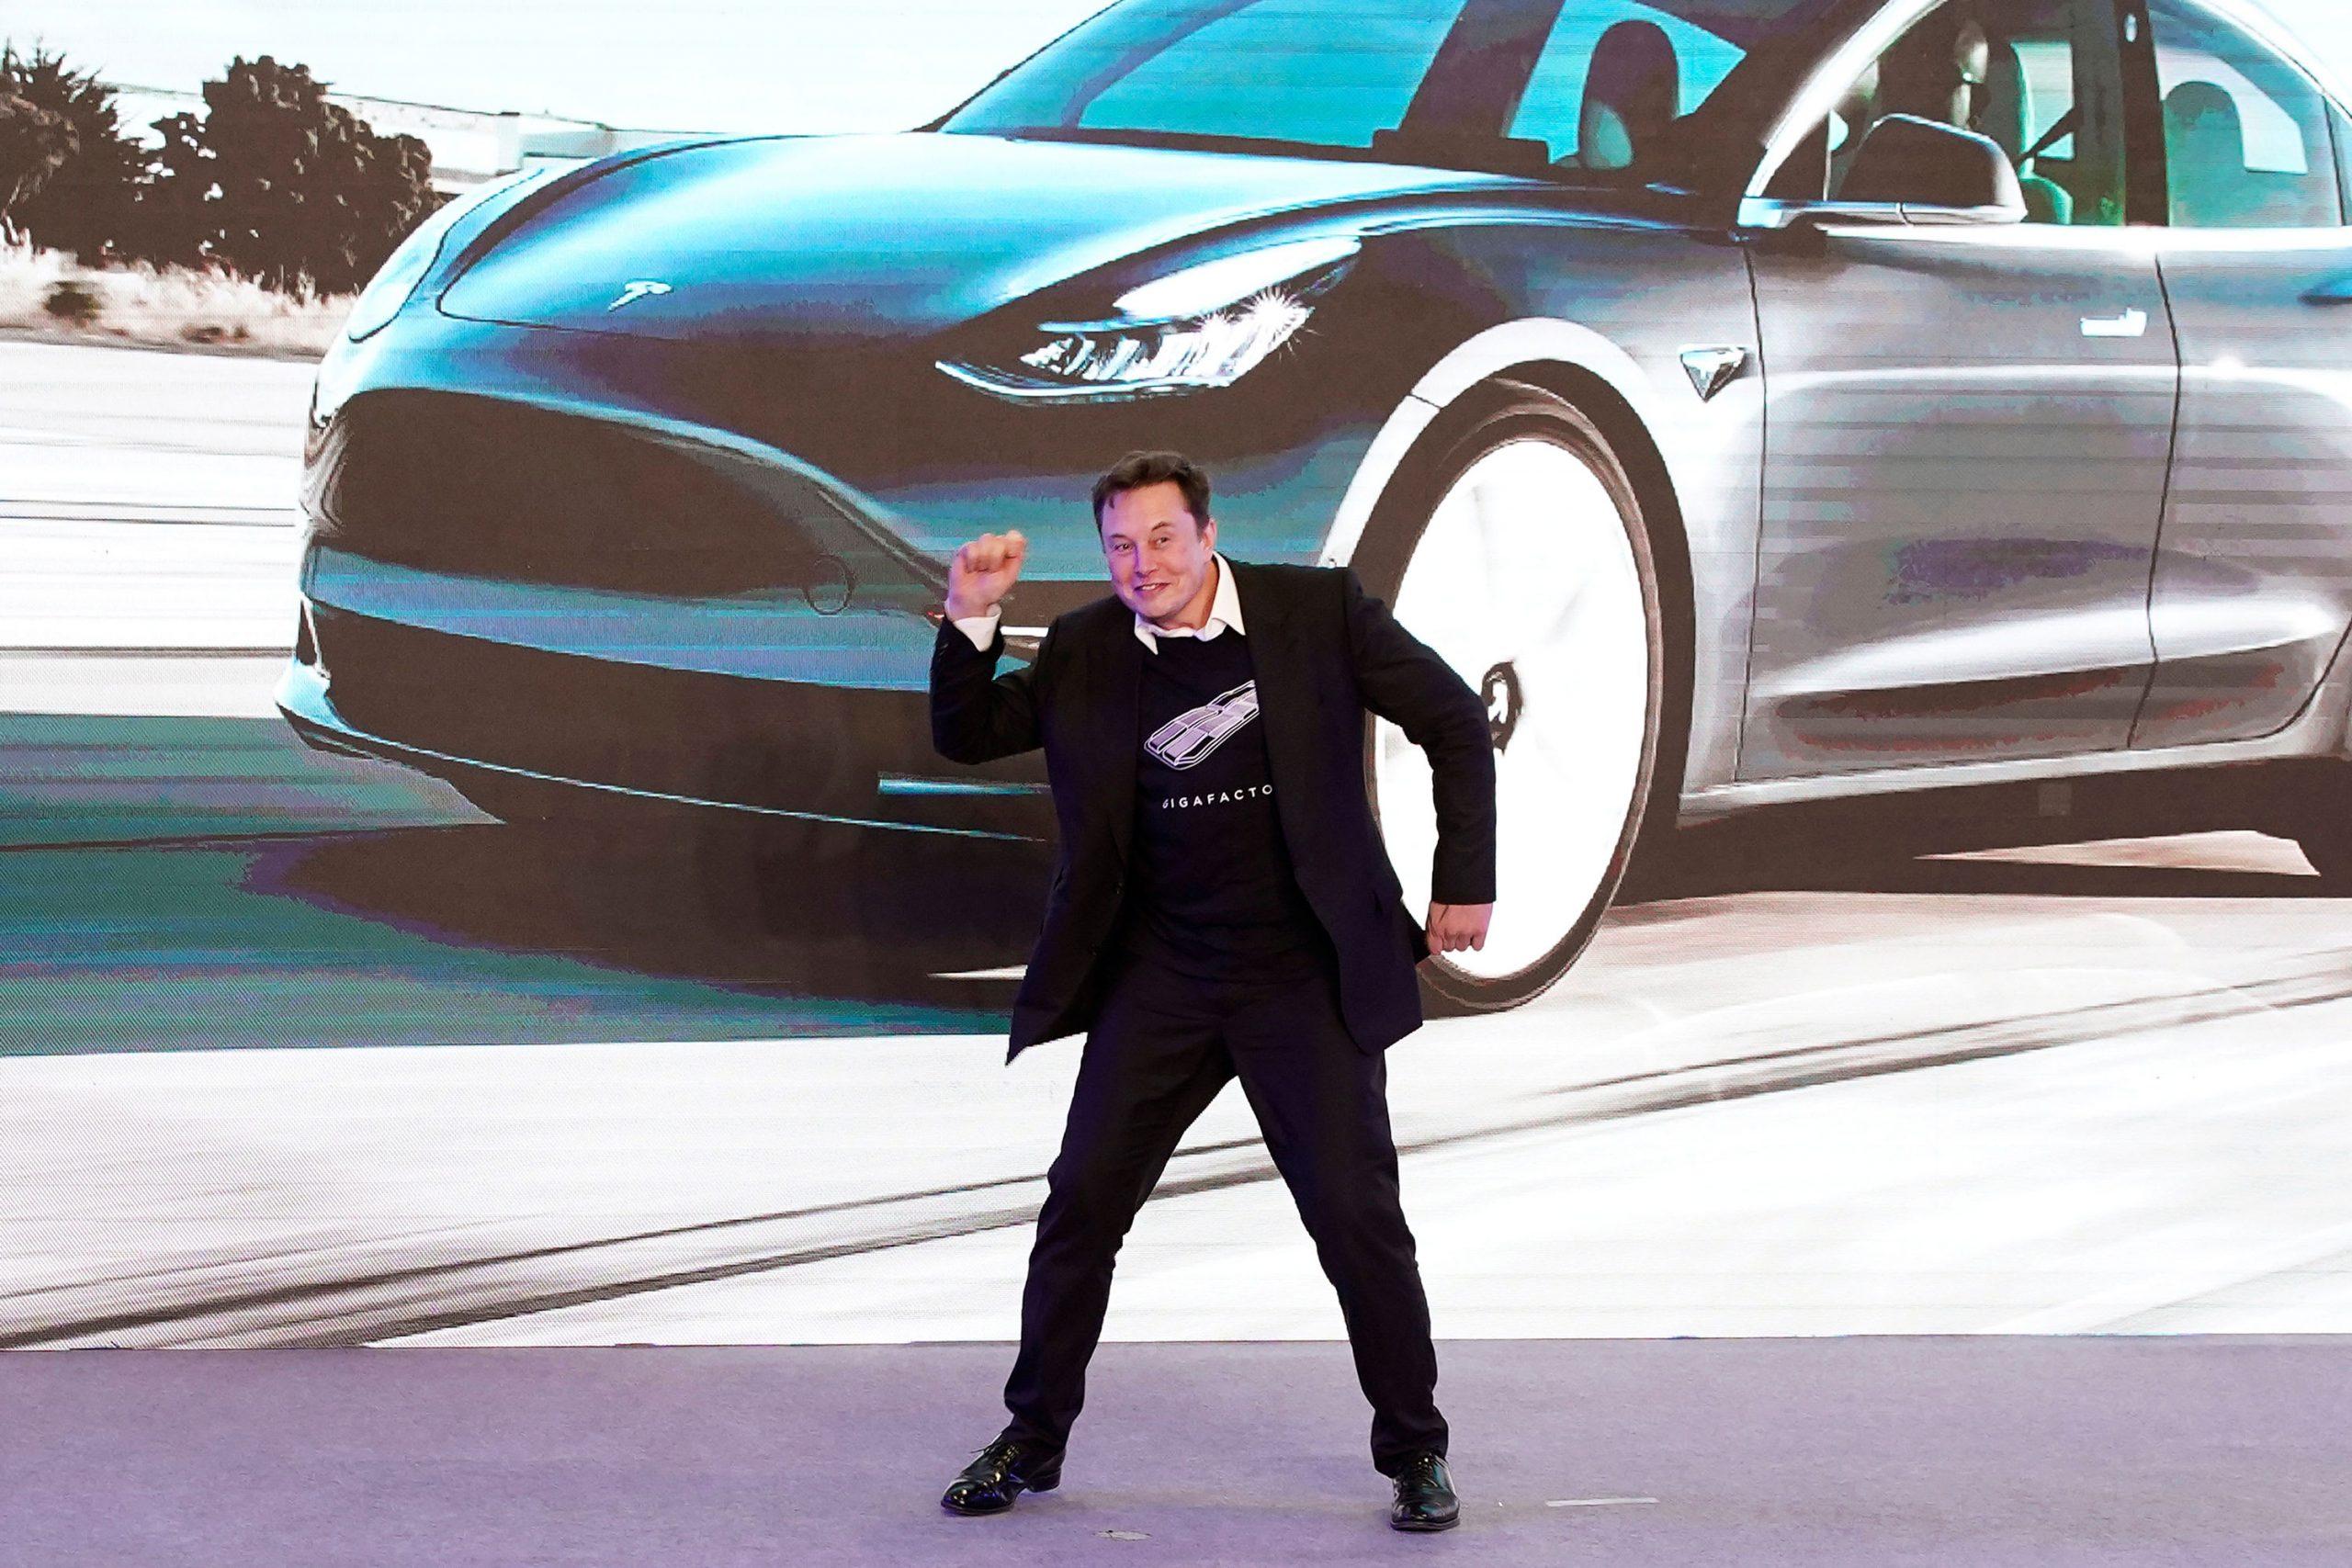 Tesla rally sends Wall Street analysts scrambling to catch up